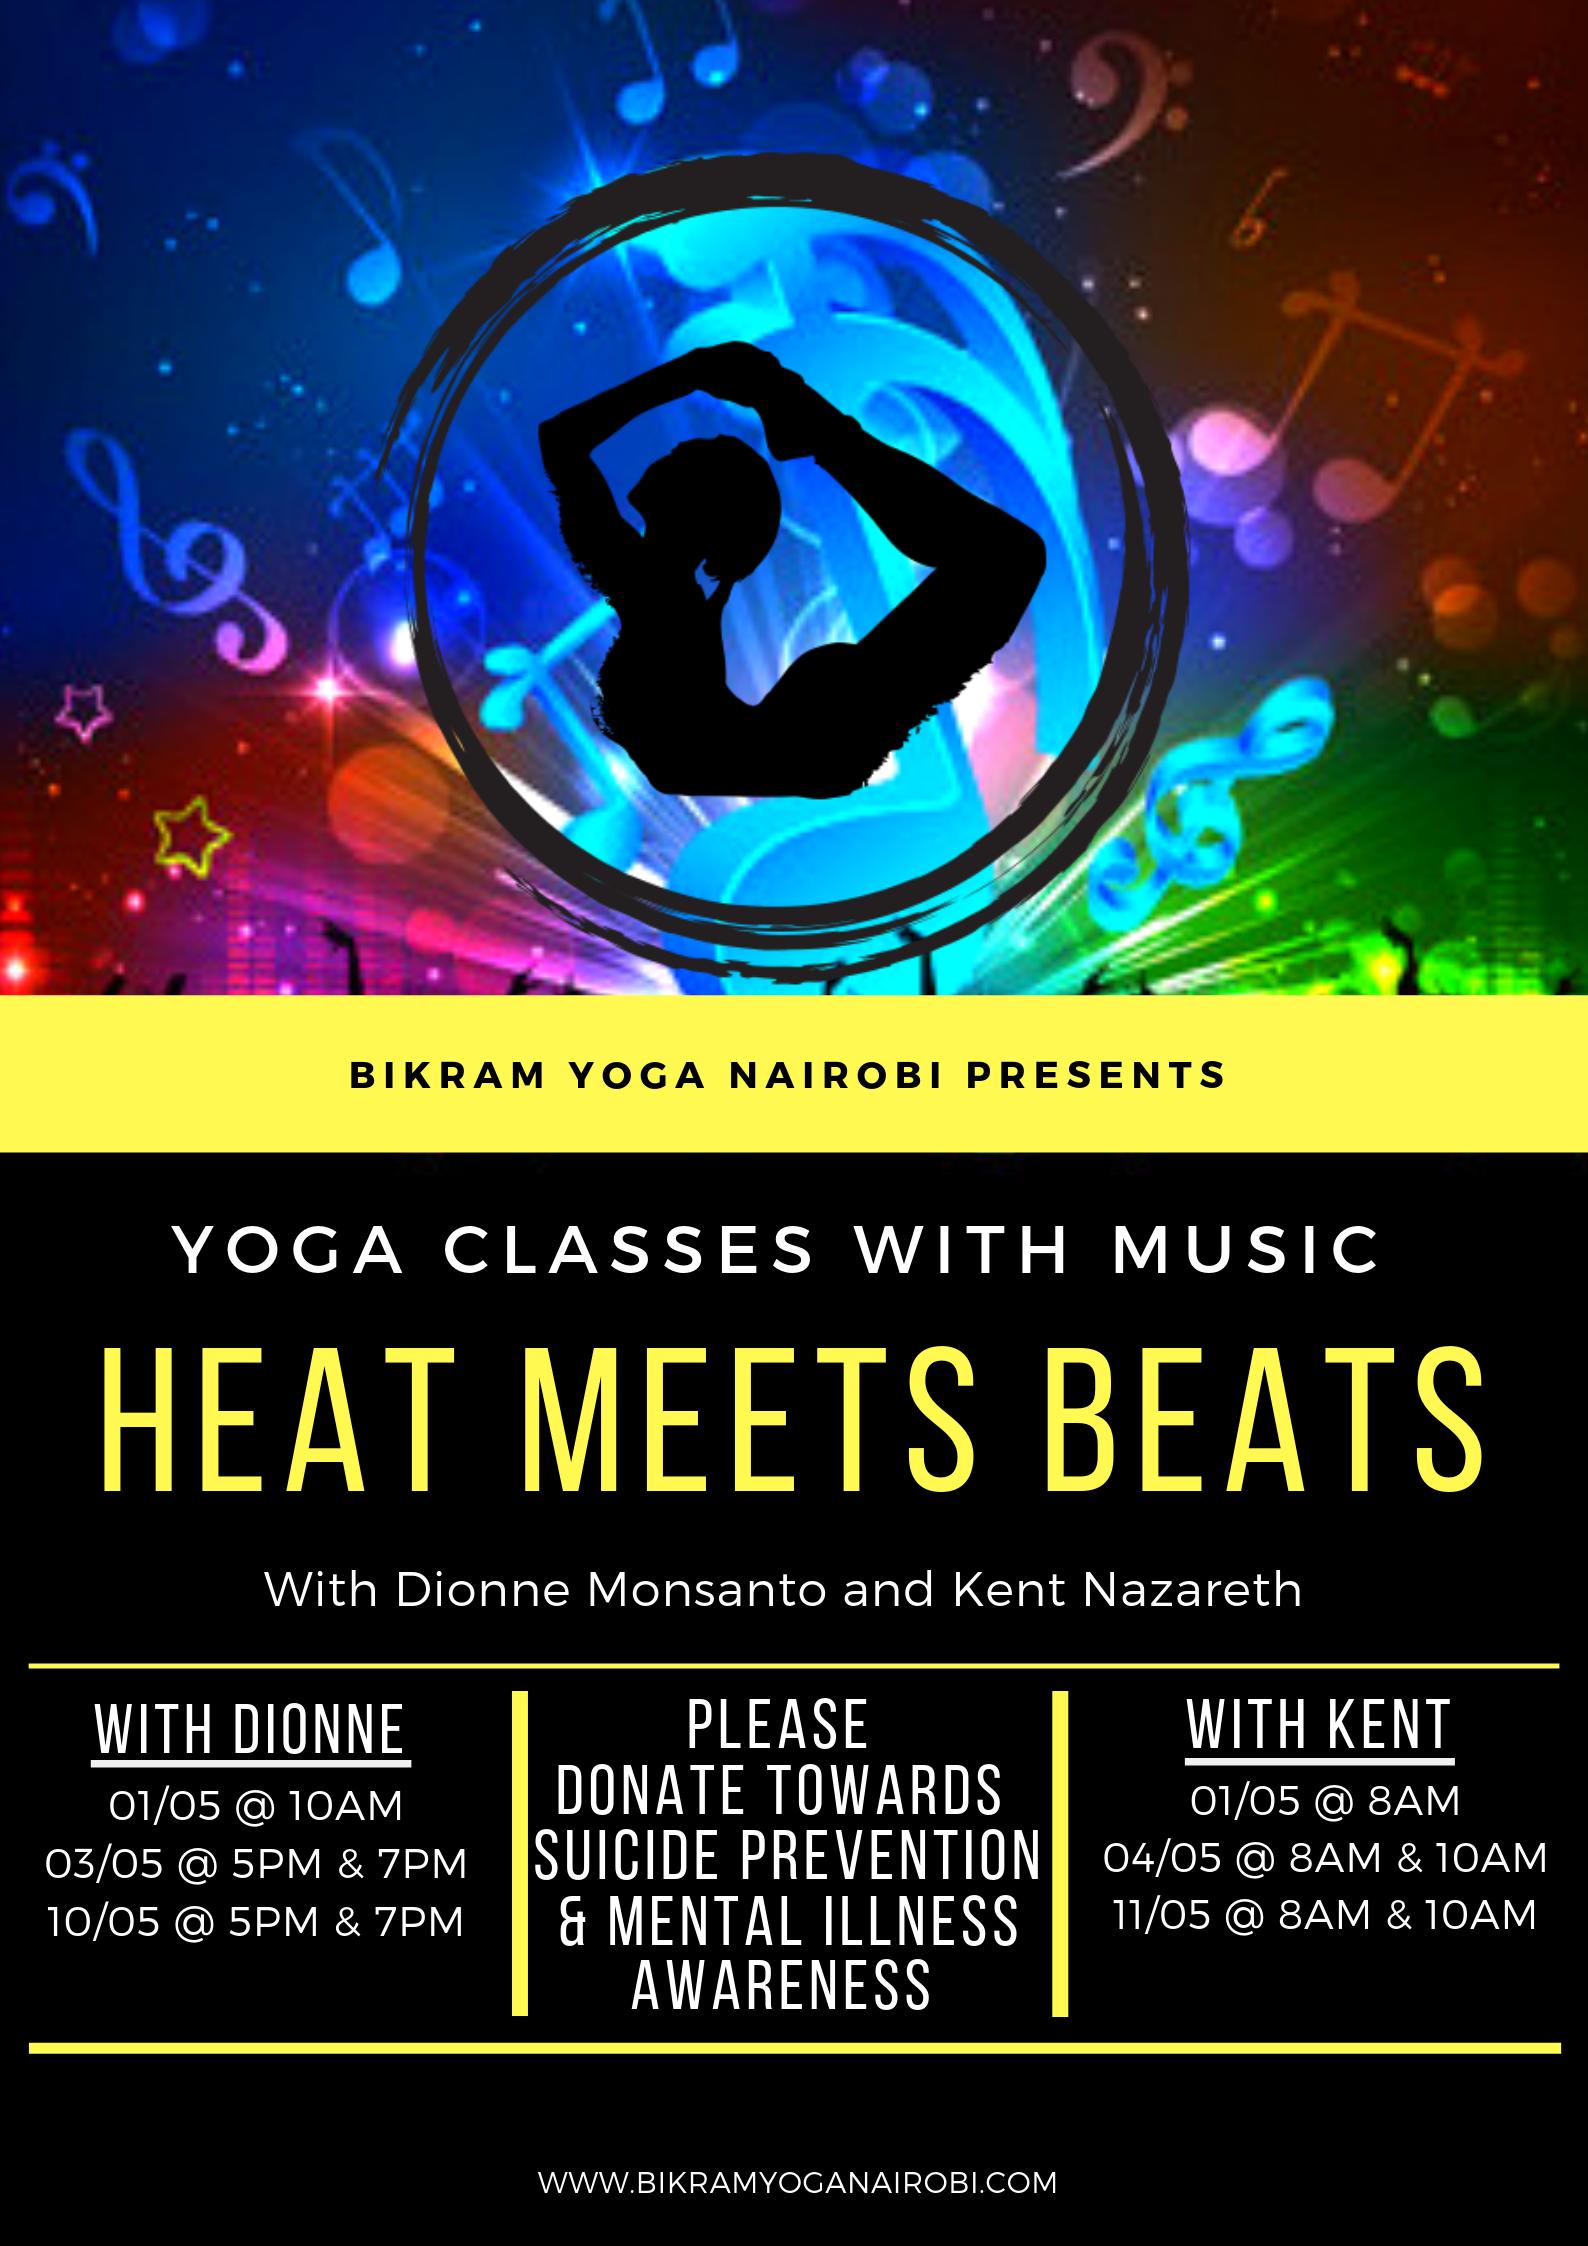 Bikram Yoga Heat Meets Beats.png